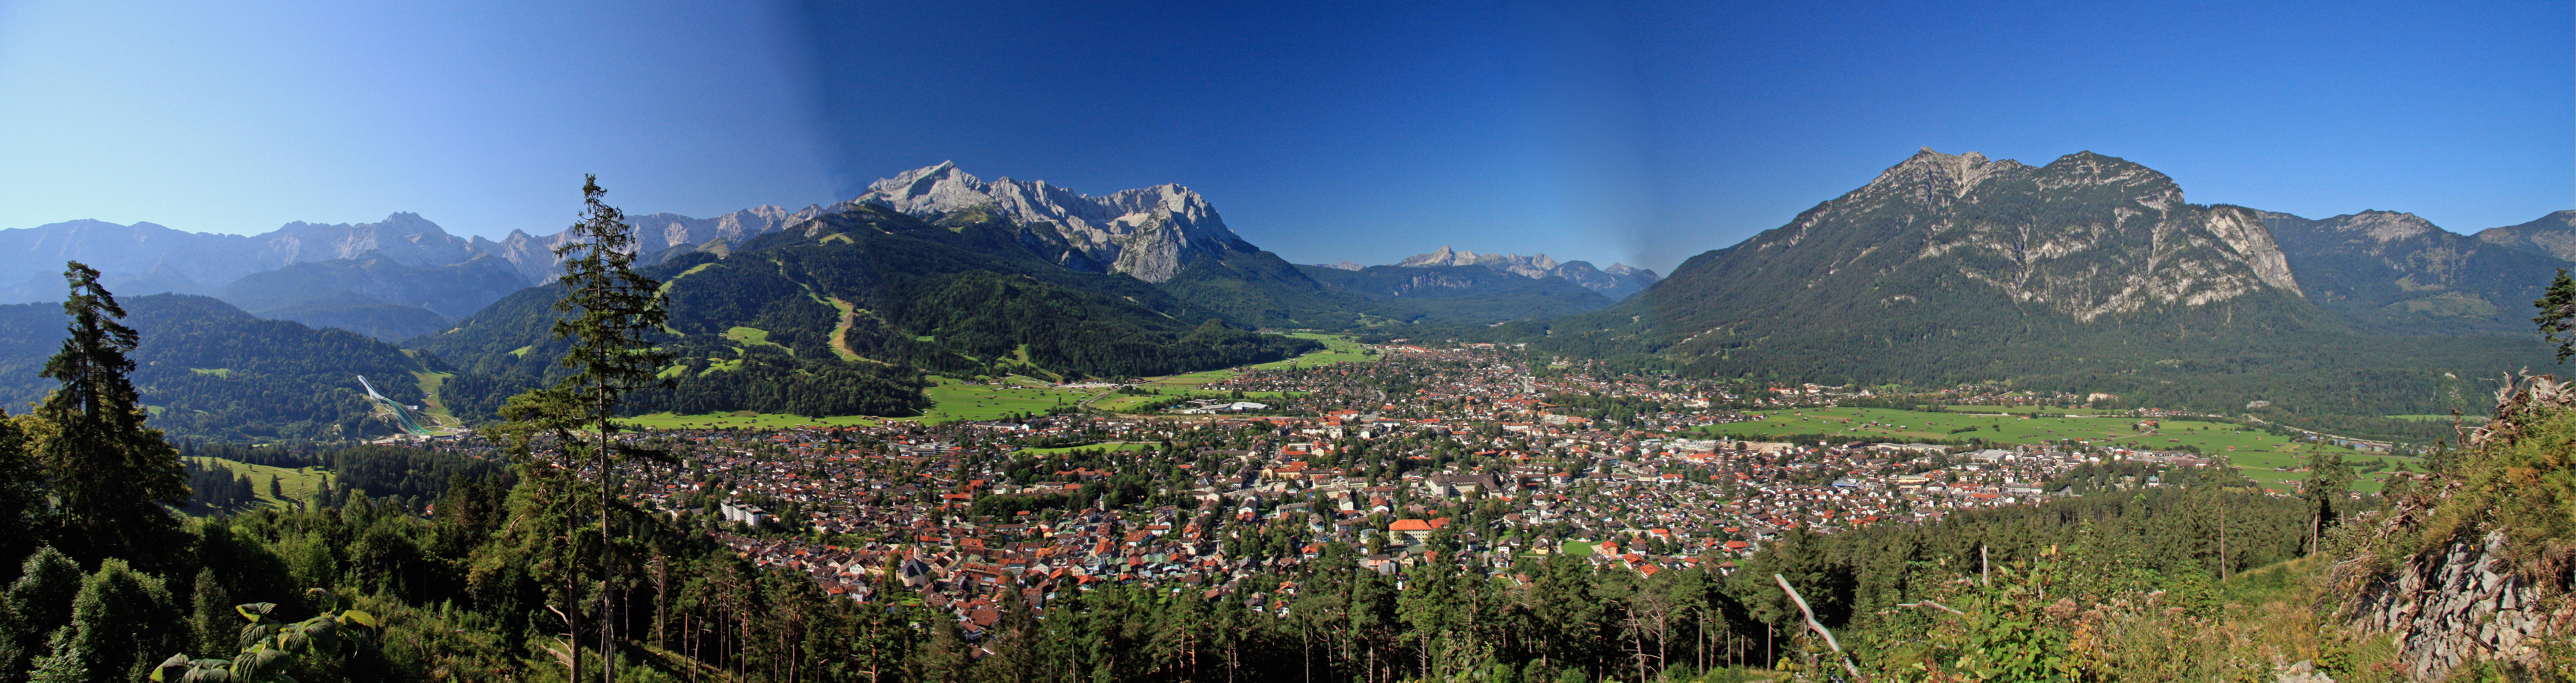 Datei garmisch partenkirchen wikipedia - Garmisch partenkirchen office du tourisme ...